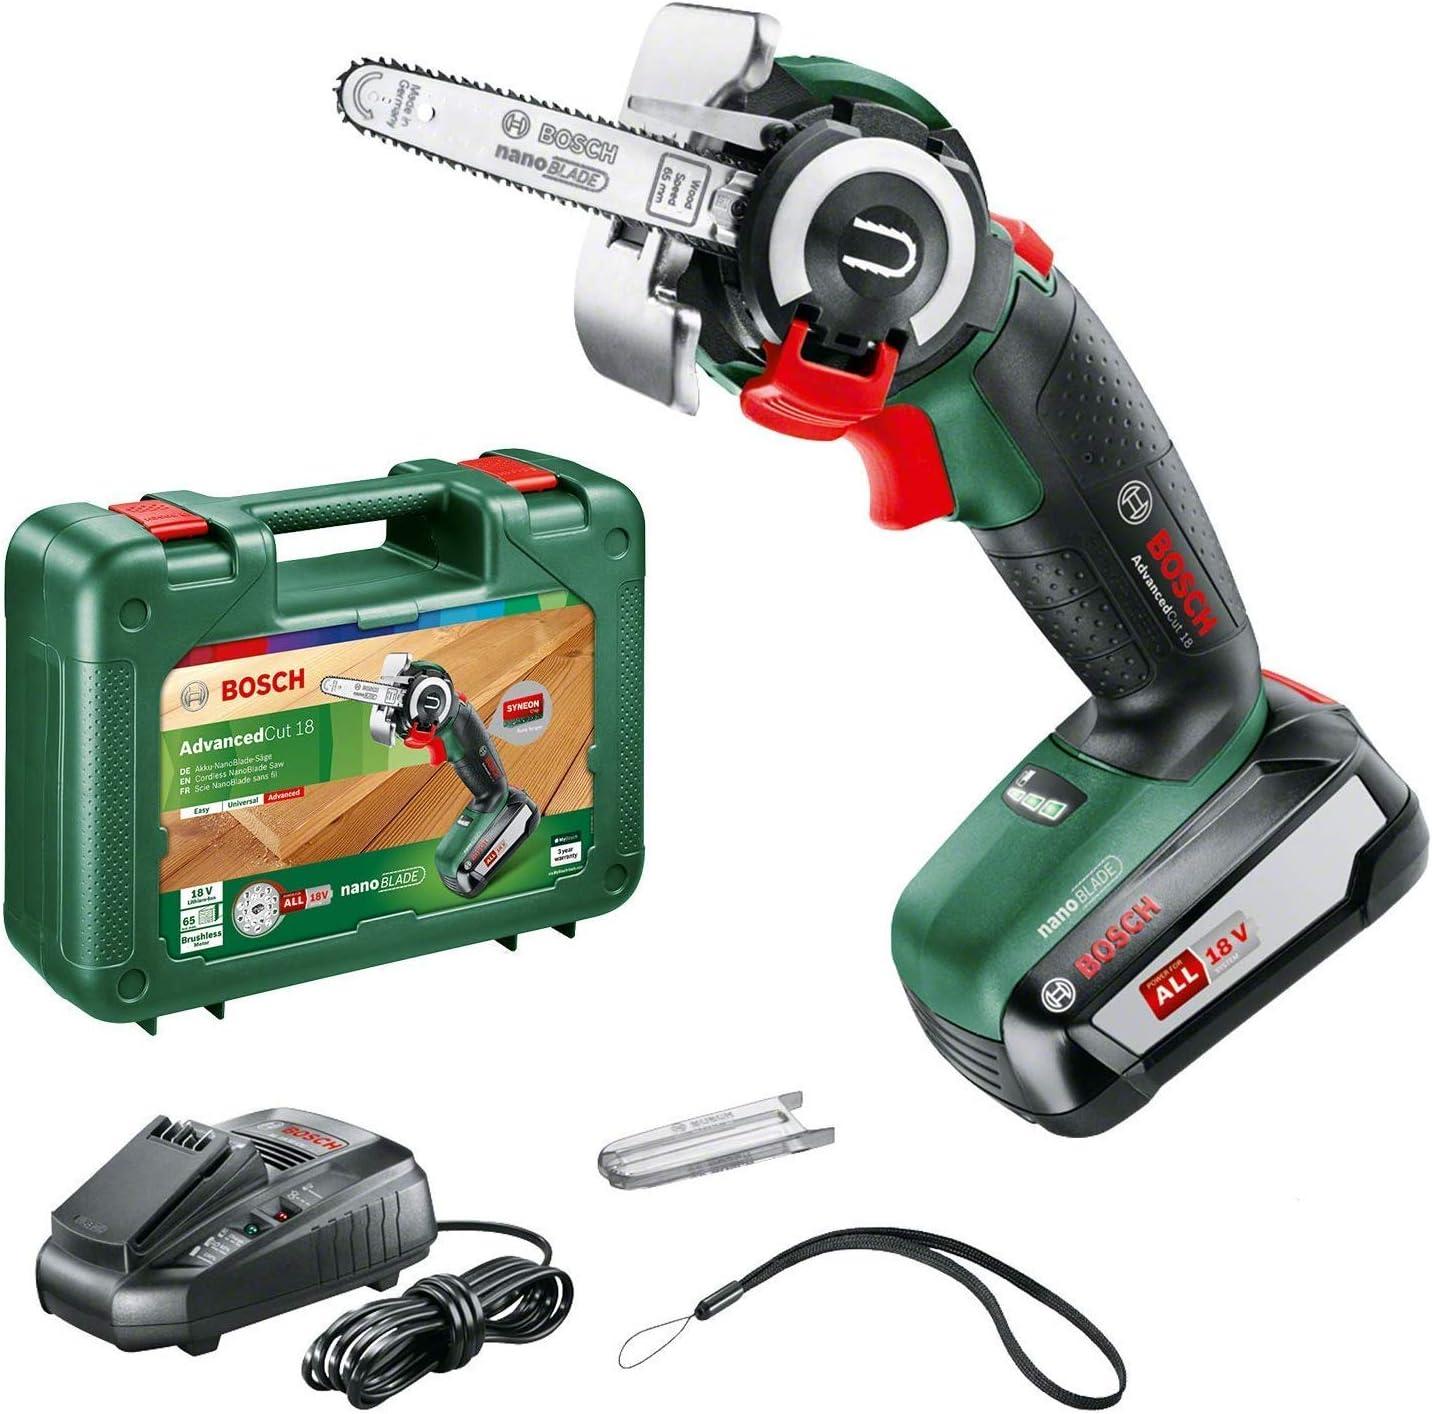 Bosch Home and Garden BOSCH 06033D5101 cadena AdvancedCut 18 (18 V, 2.5, Sistema SDS, Hoja de sierra nanoBLADE para madera 65mm, maletín), 45 W, Negro, Verde, Rojo, Plata, 1 batería (2,5 Ah)